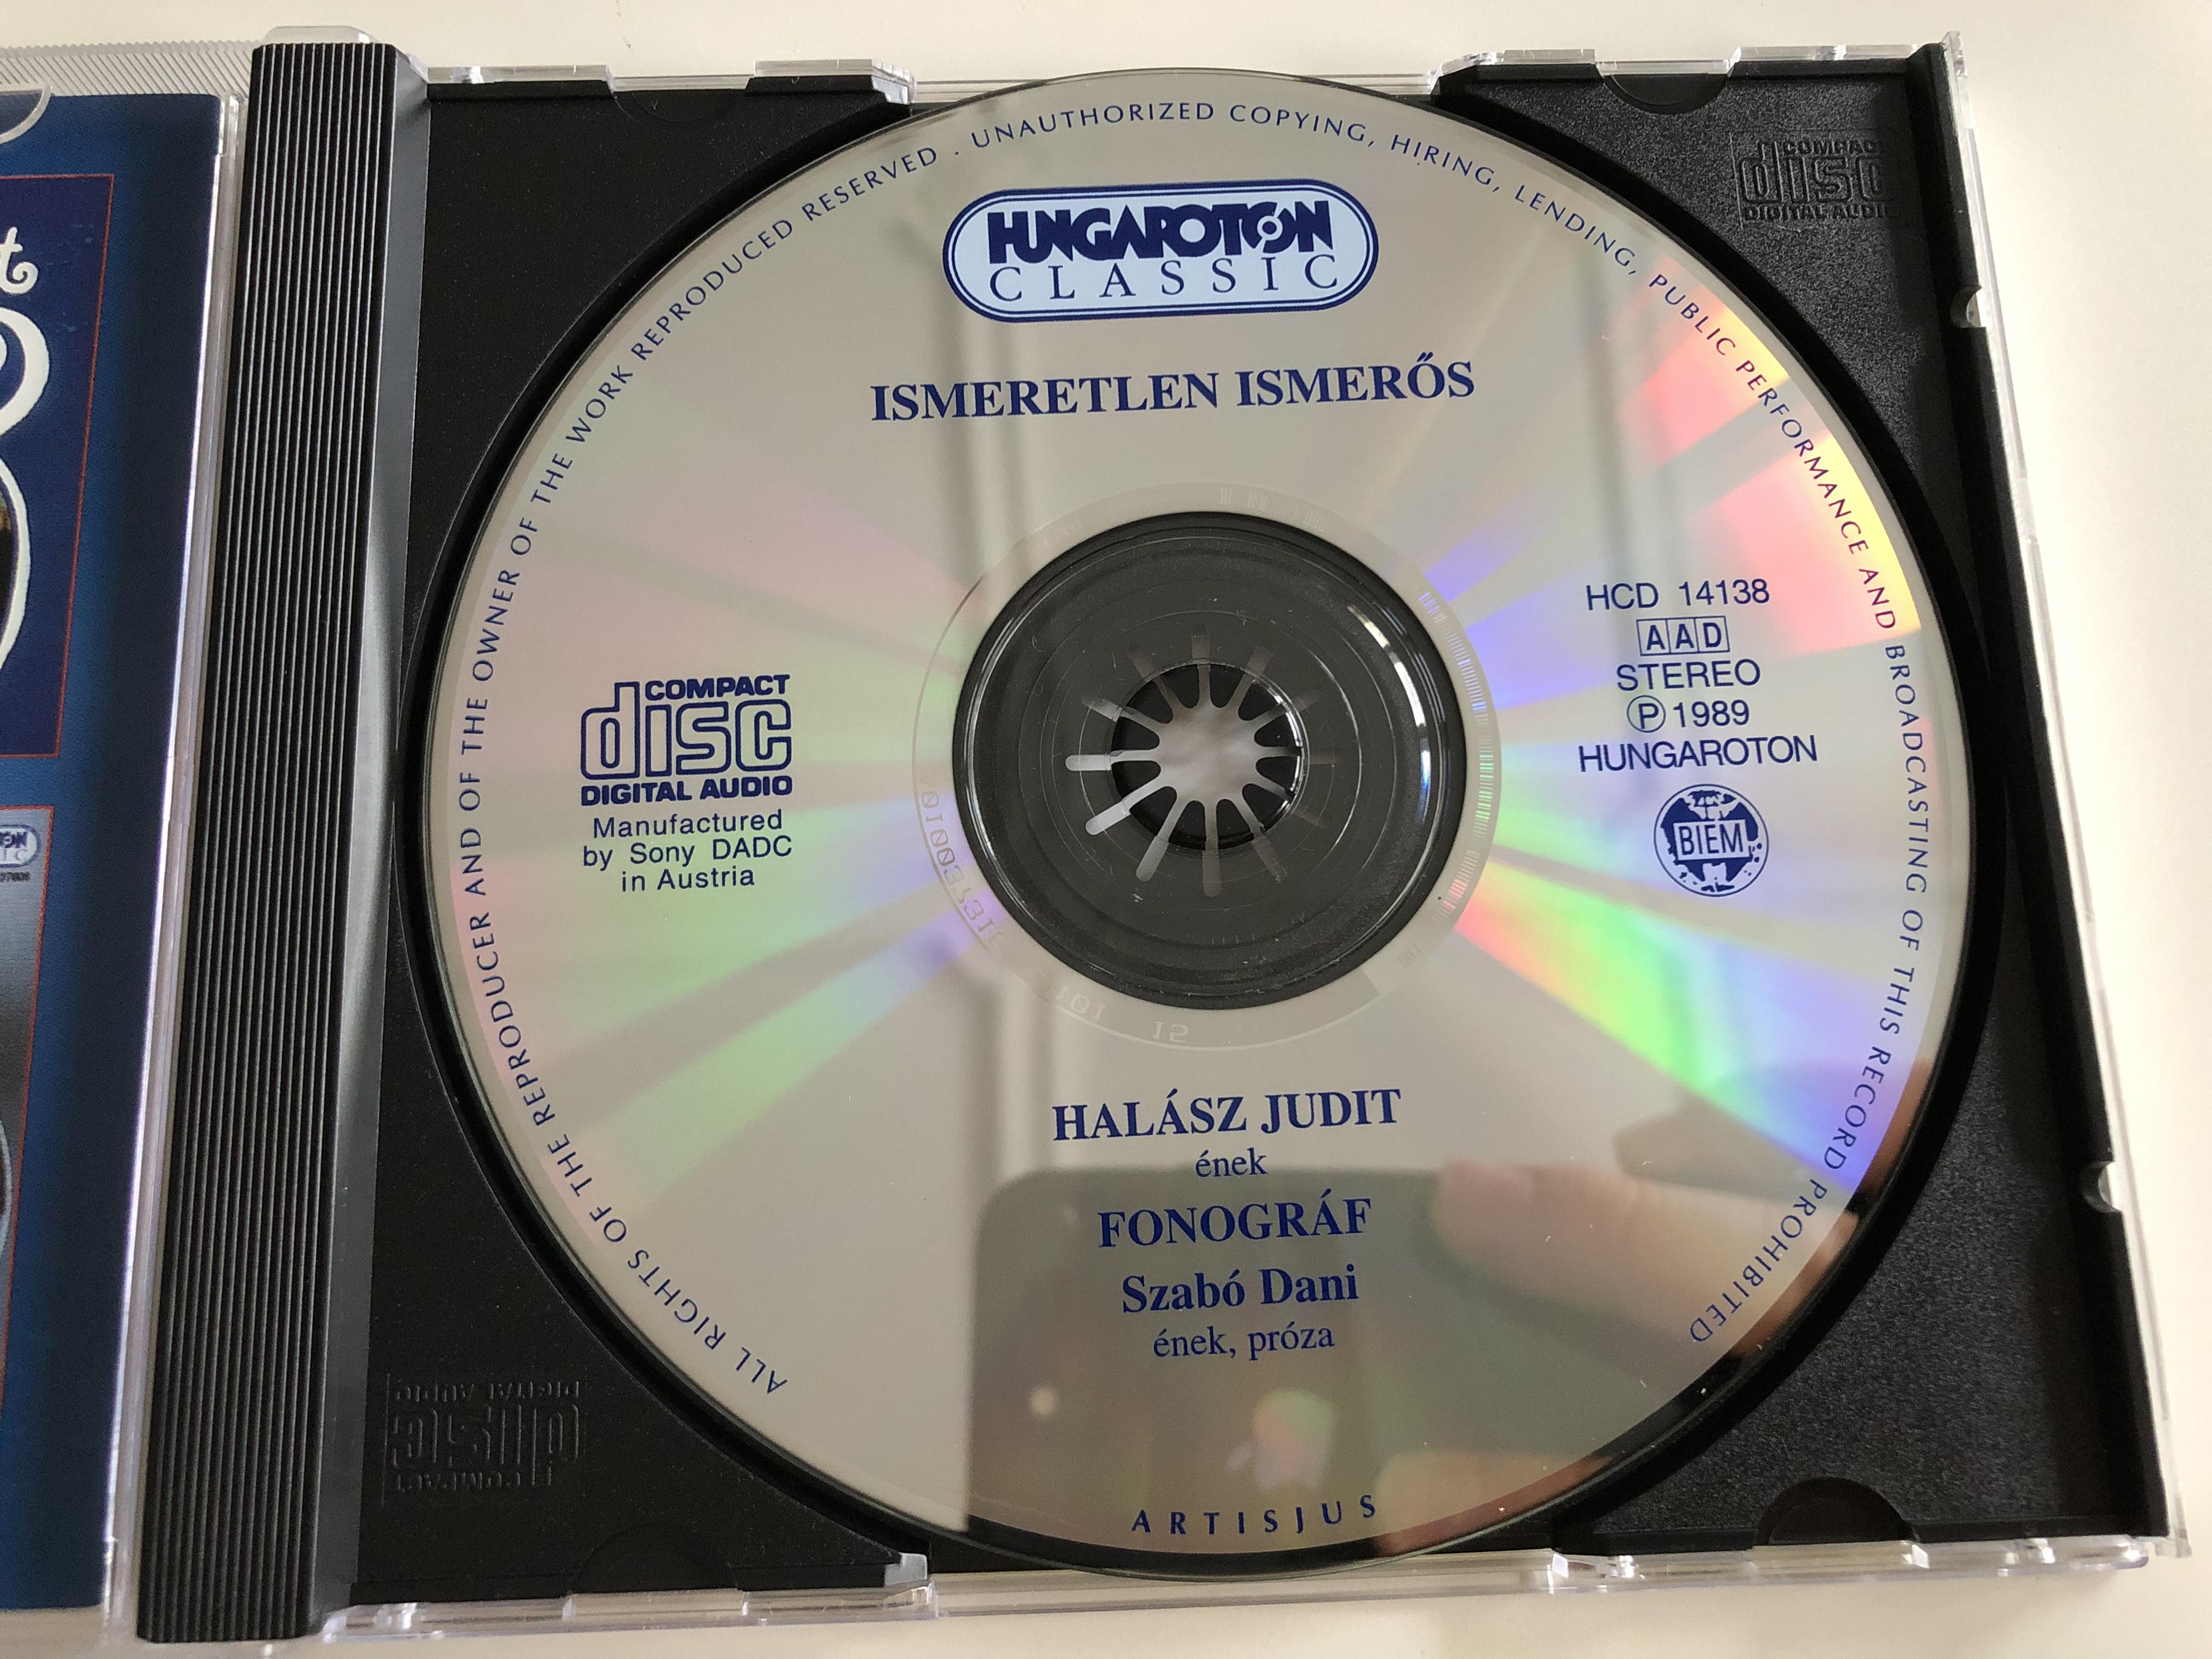 hal-sz-judit-ismeretlen-ismer-s-fonogr-f-audio-cd-2001-hungarian-songs-for-children-hungaroton-classic-hcd-14138-332035911-.jpg